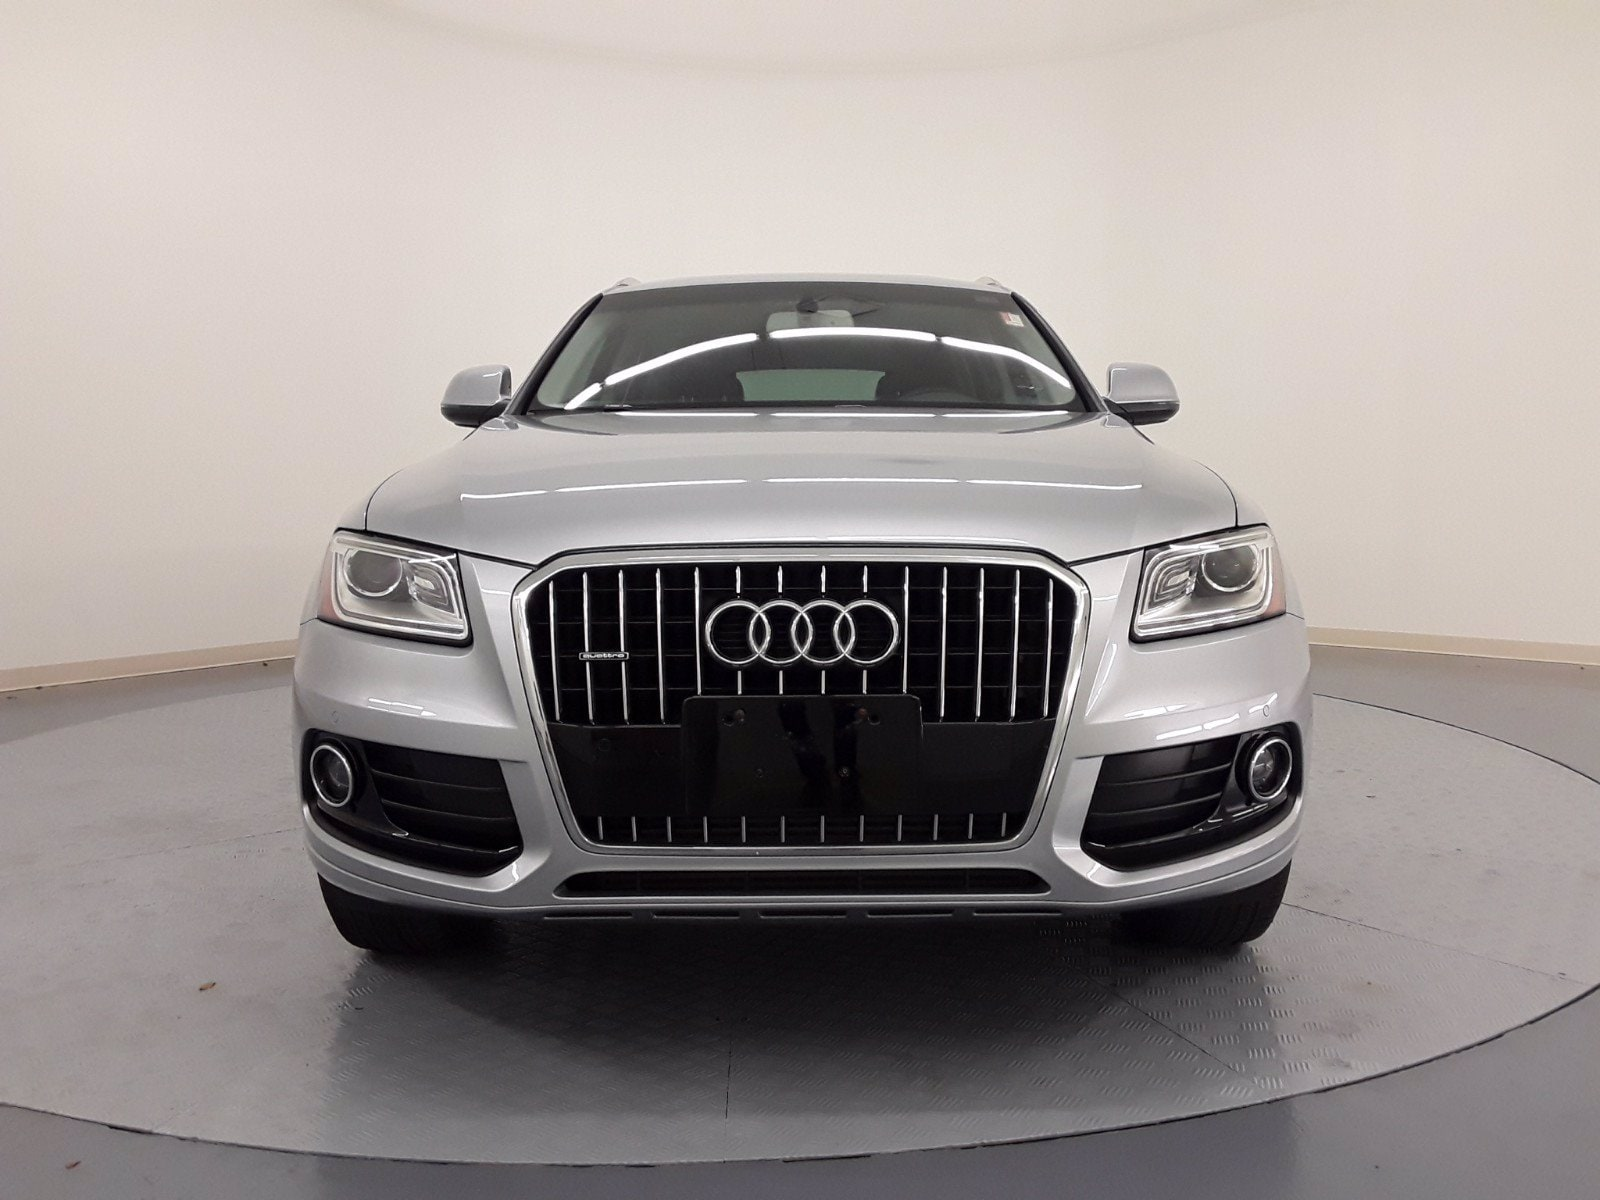 Used 2015 Audi Q5 For Sale In Houston Tx Stock Sfa042596